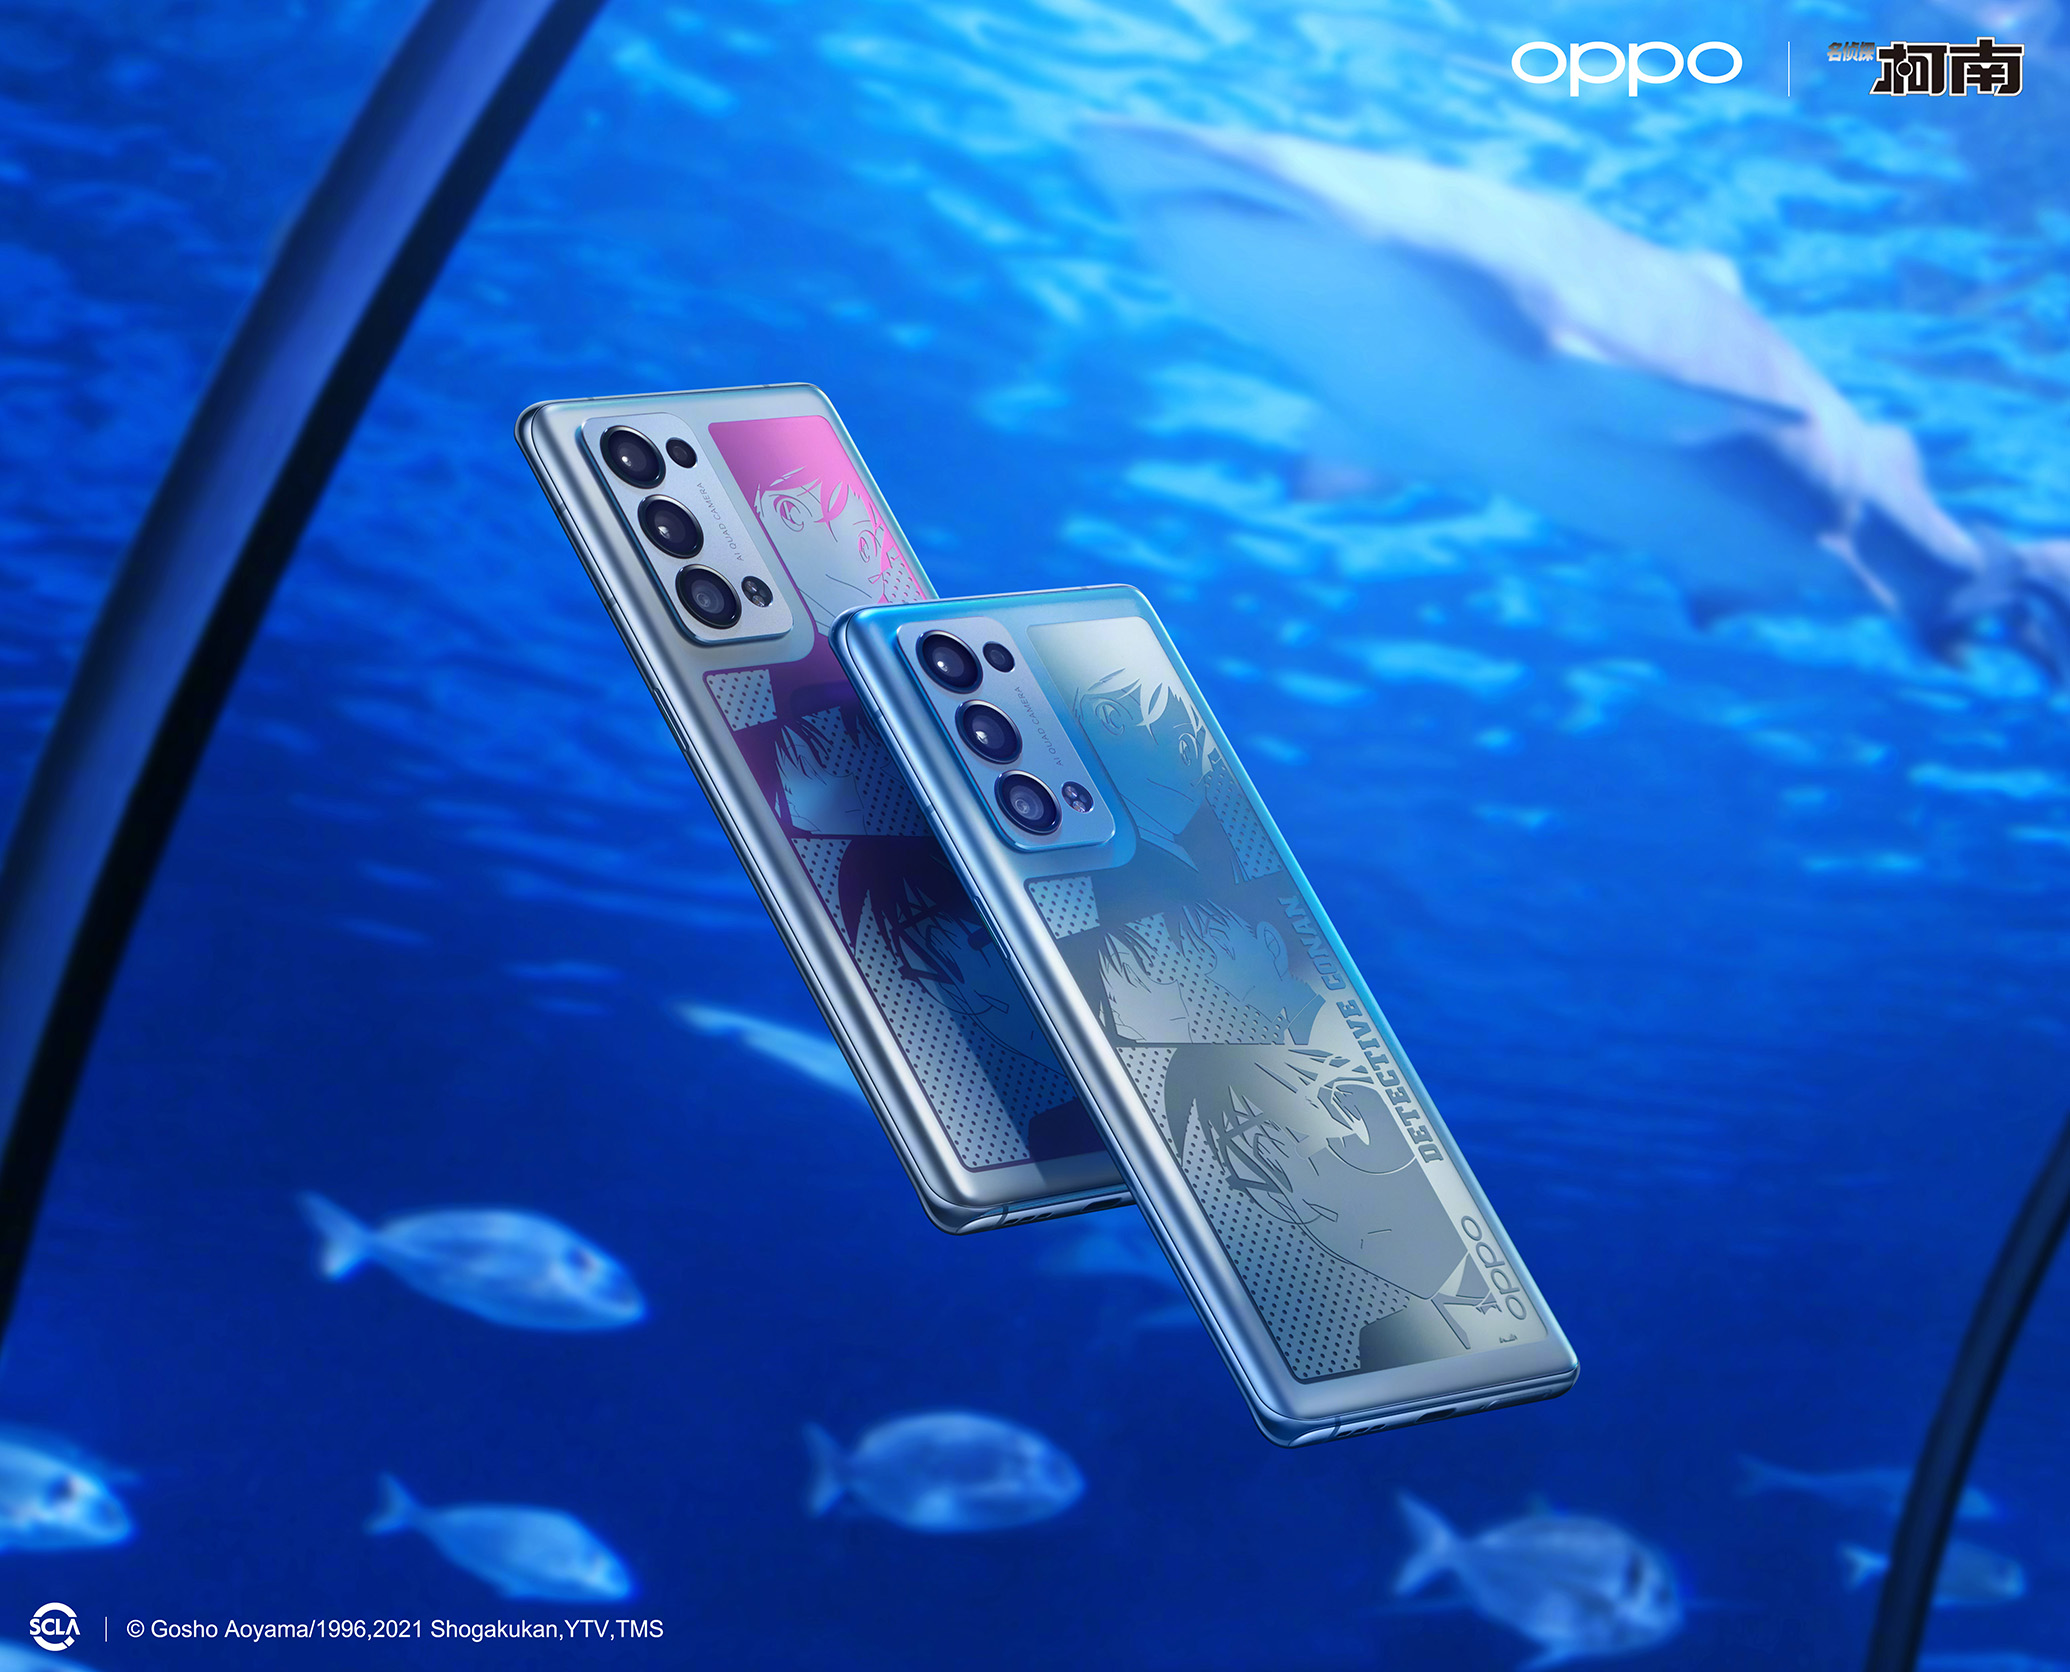 OPPO представила новый Reno 6 Pro+ Другие устройства  - dla_nastoaschih_cenitelej_oppo_predstavila_novuu_versiu_reno_6_pro_3